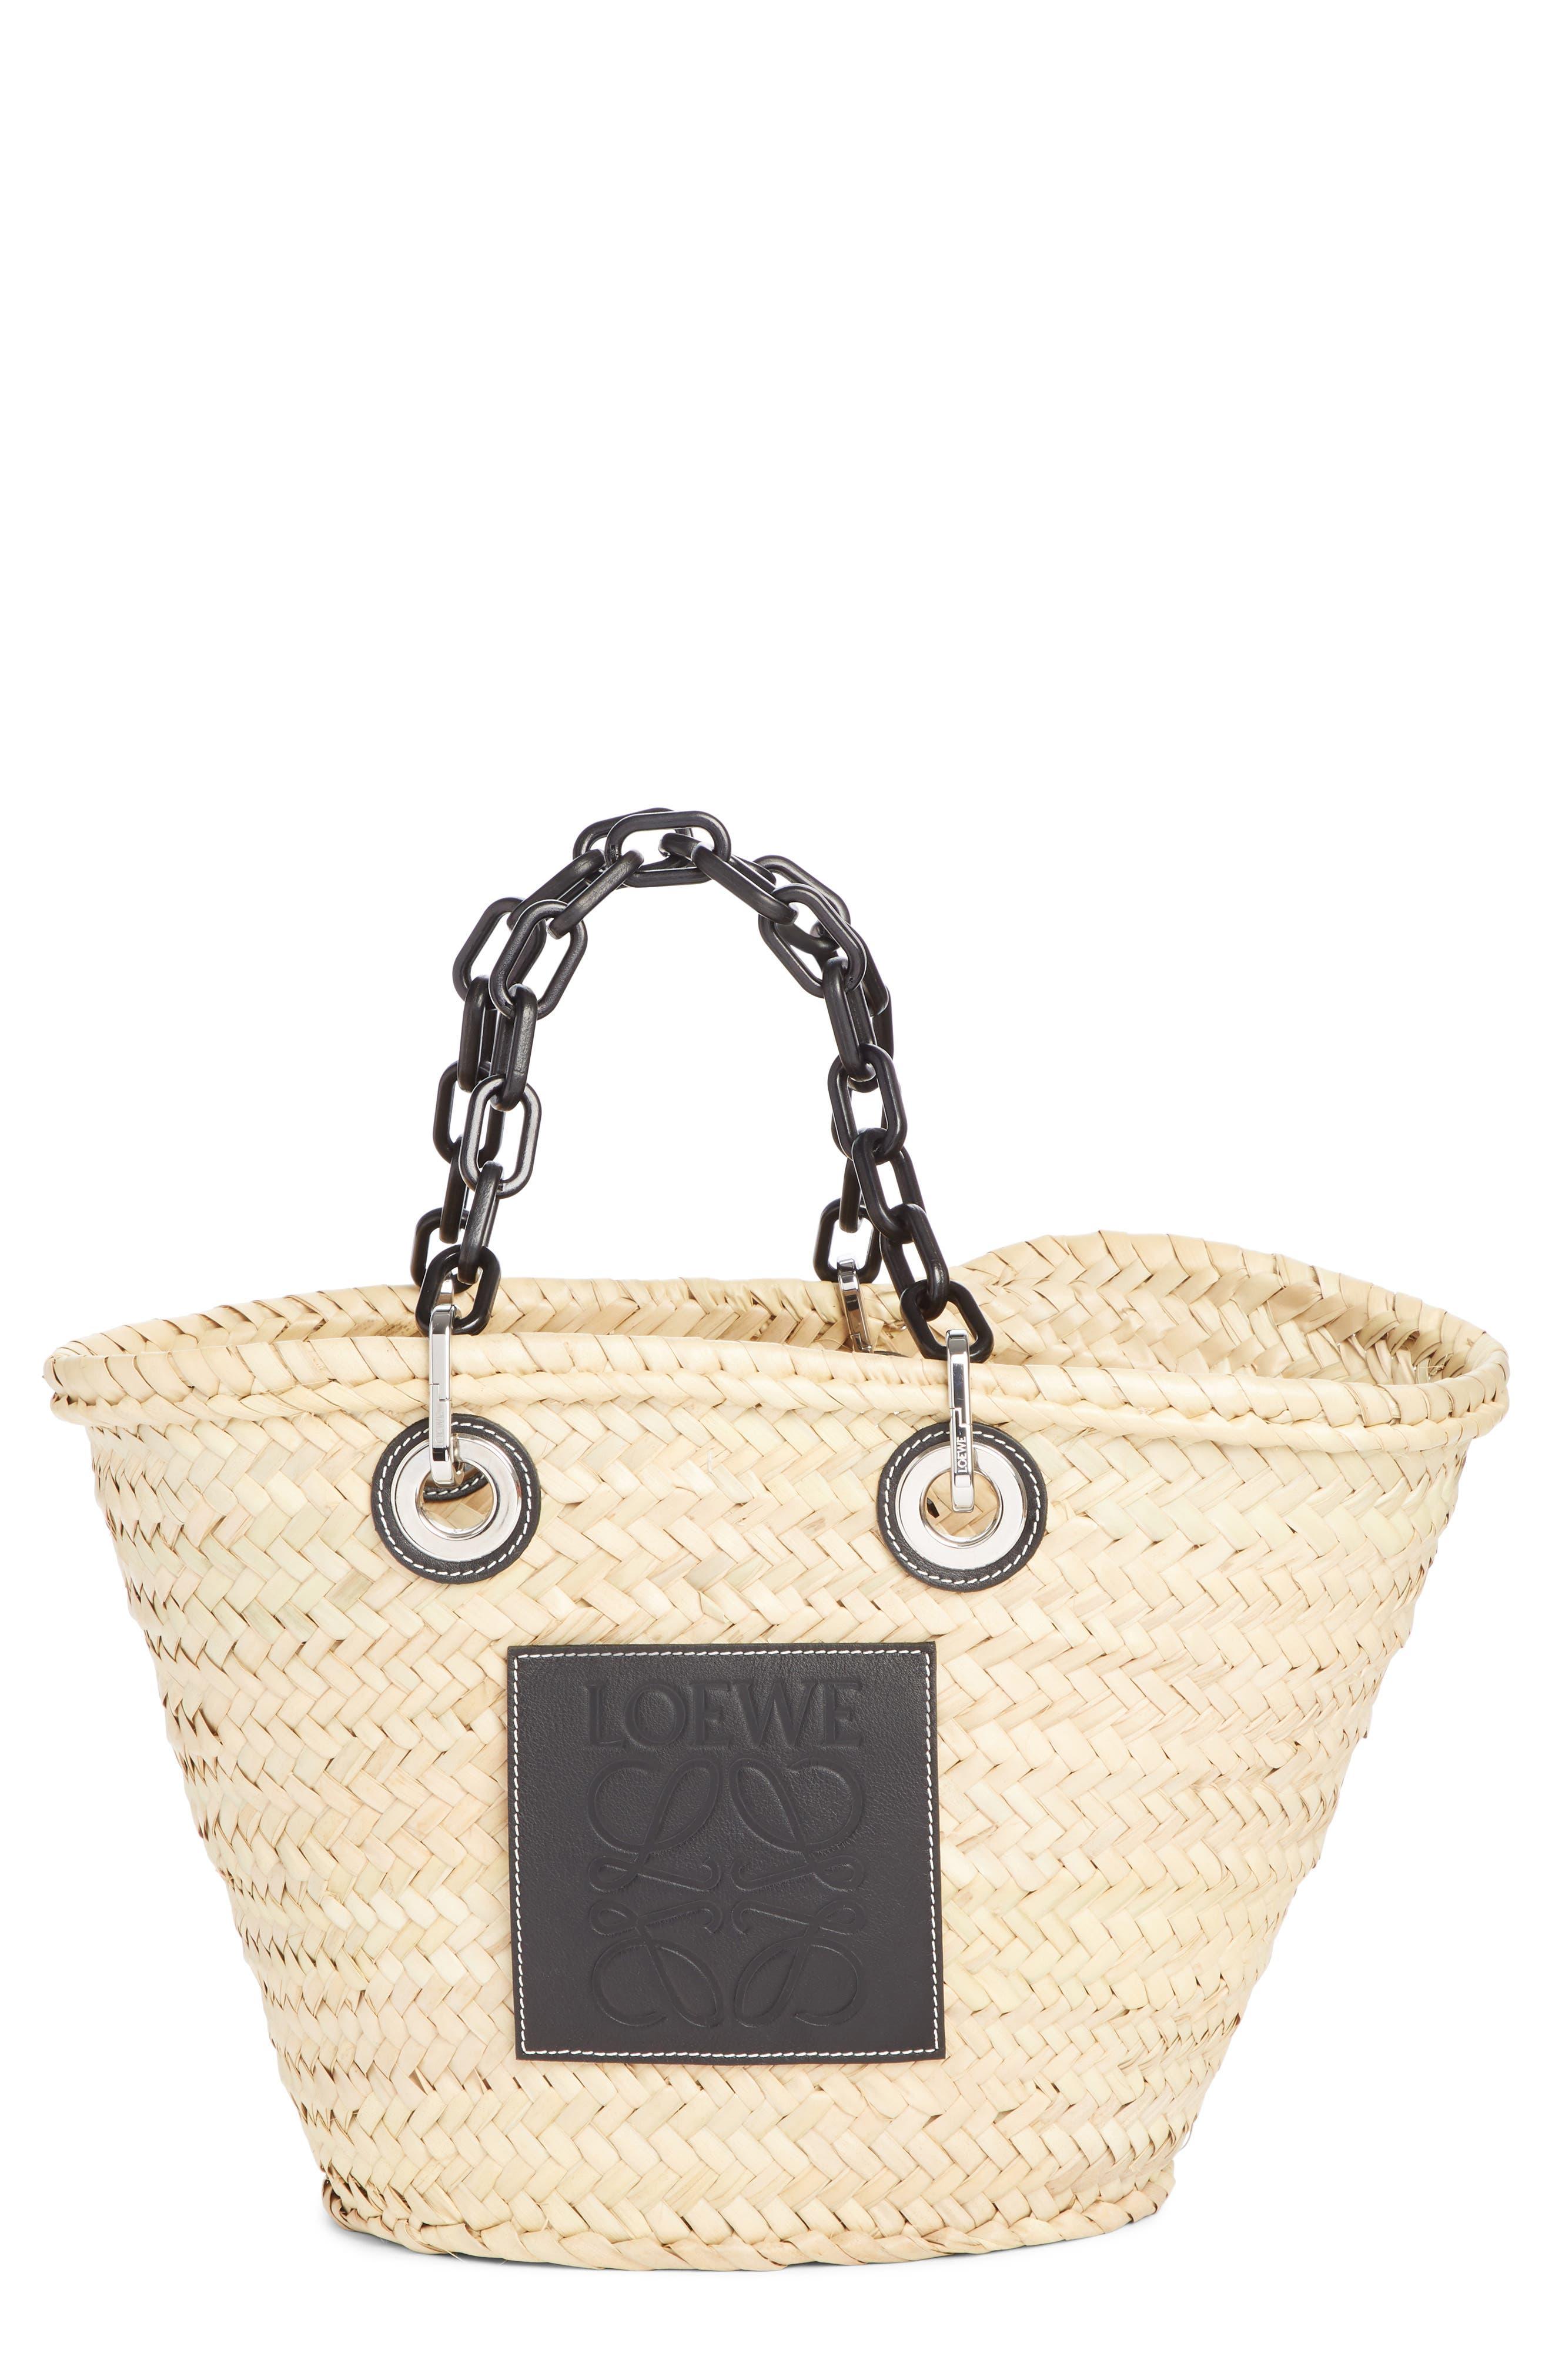 LOEWE, Chain Handle Woven Palm Market Basket, Main thumbnail 1, color, NATURAL/ BLACK